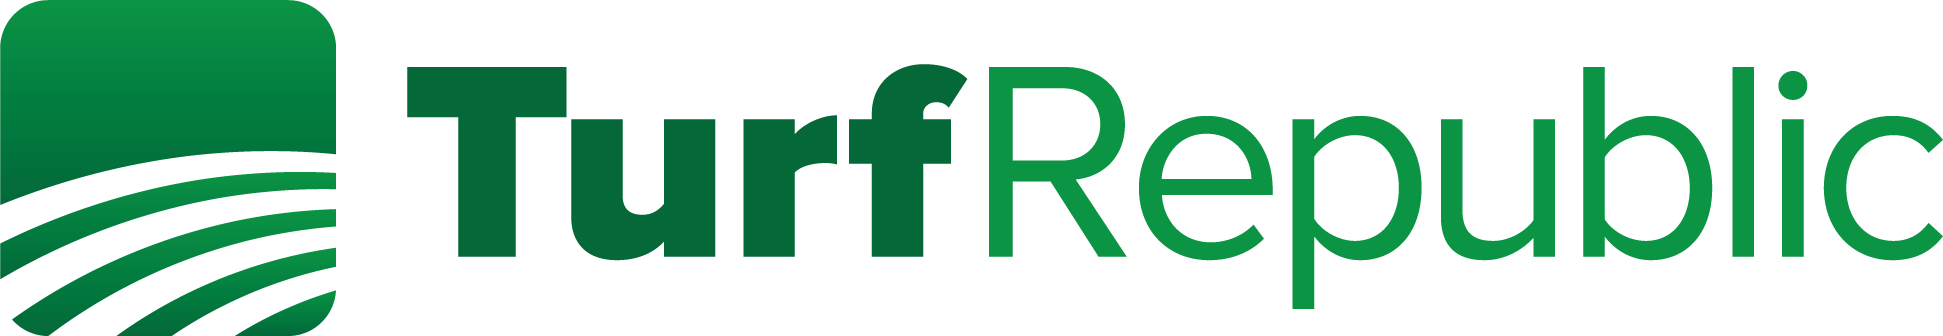 turfrepublic_logo_color